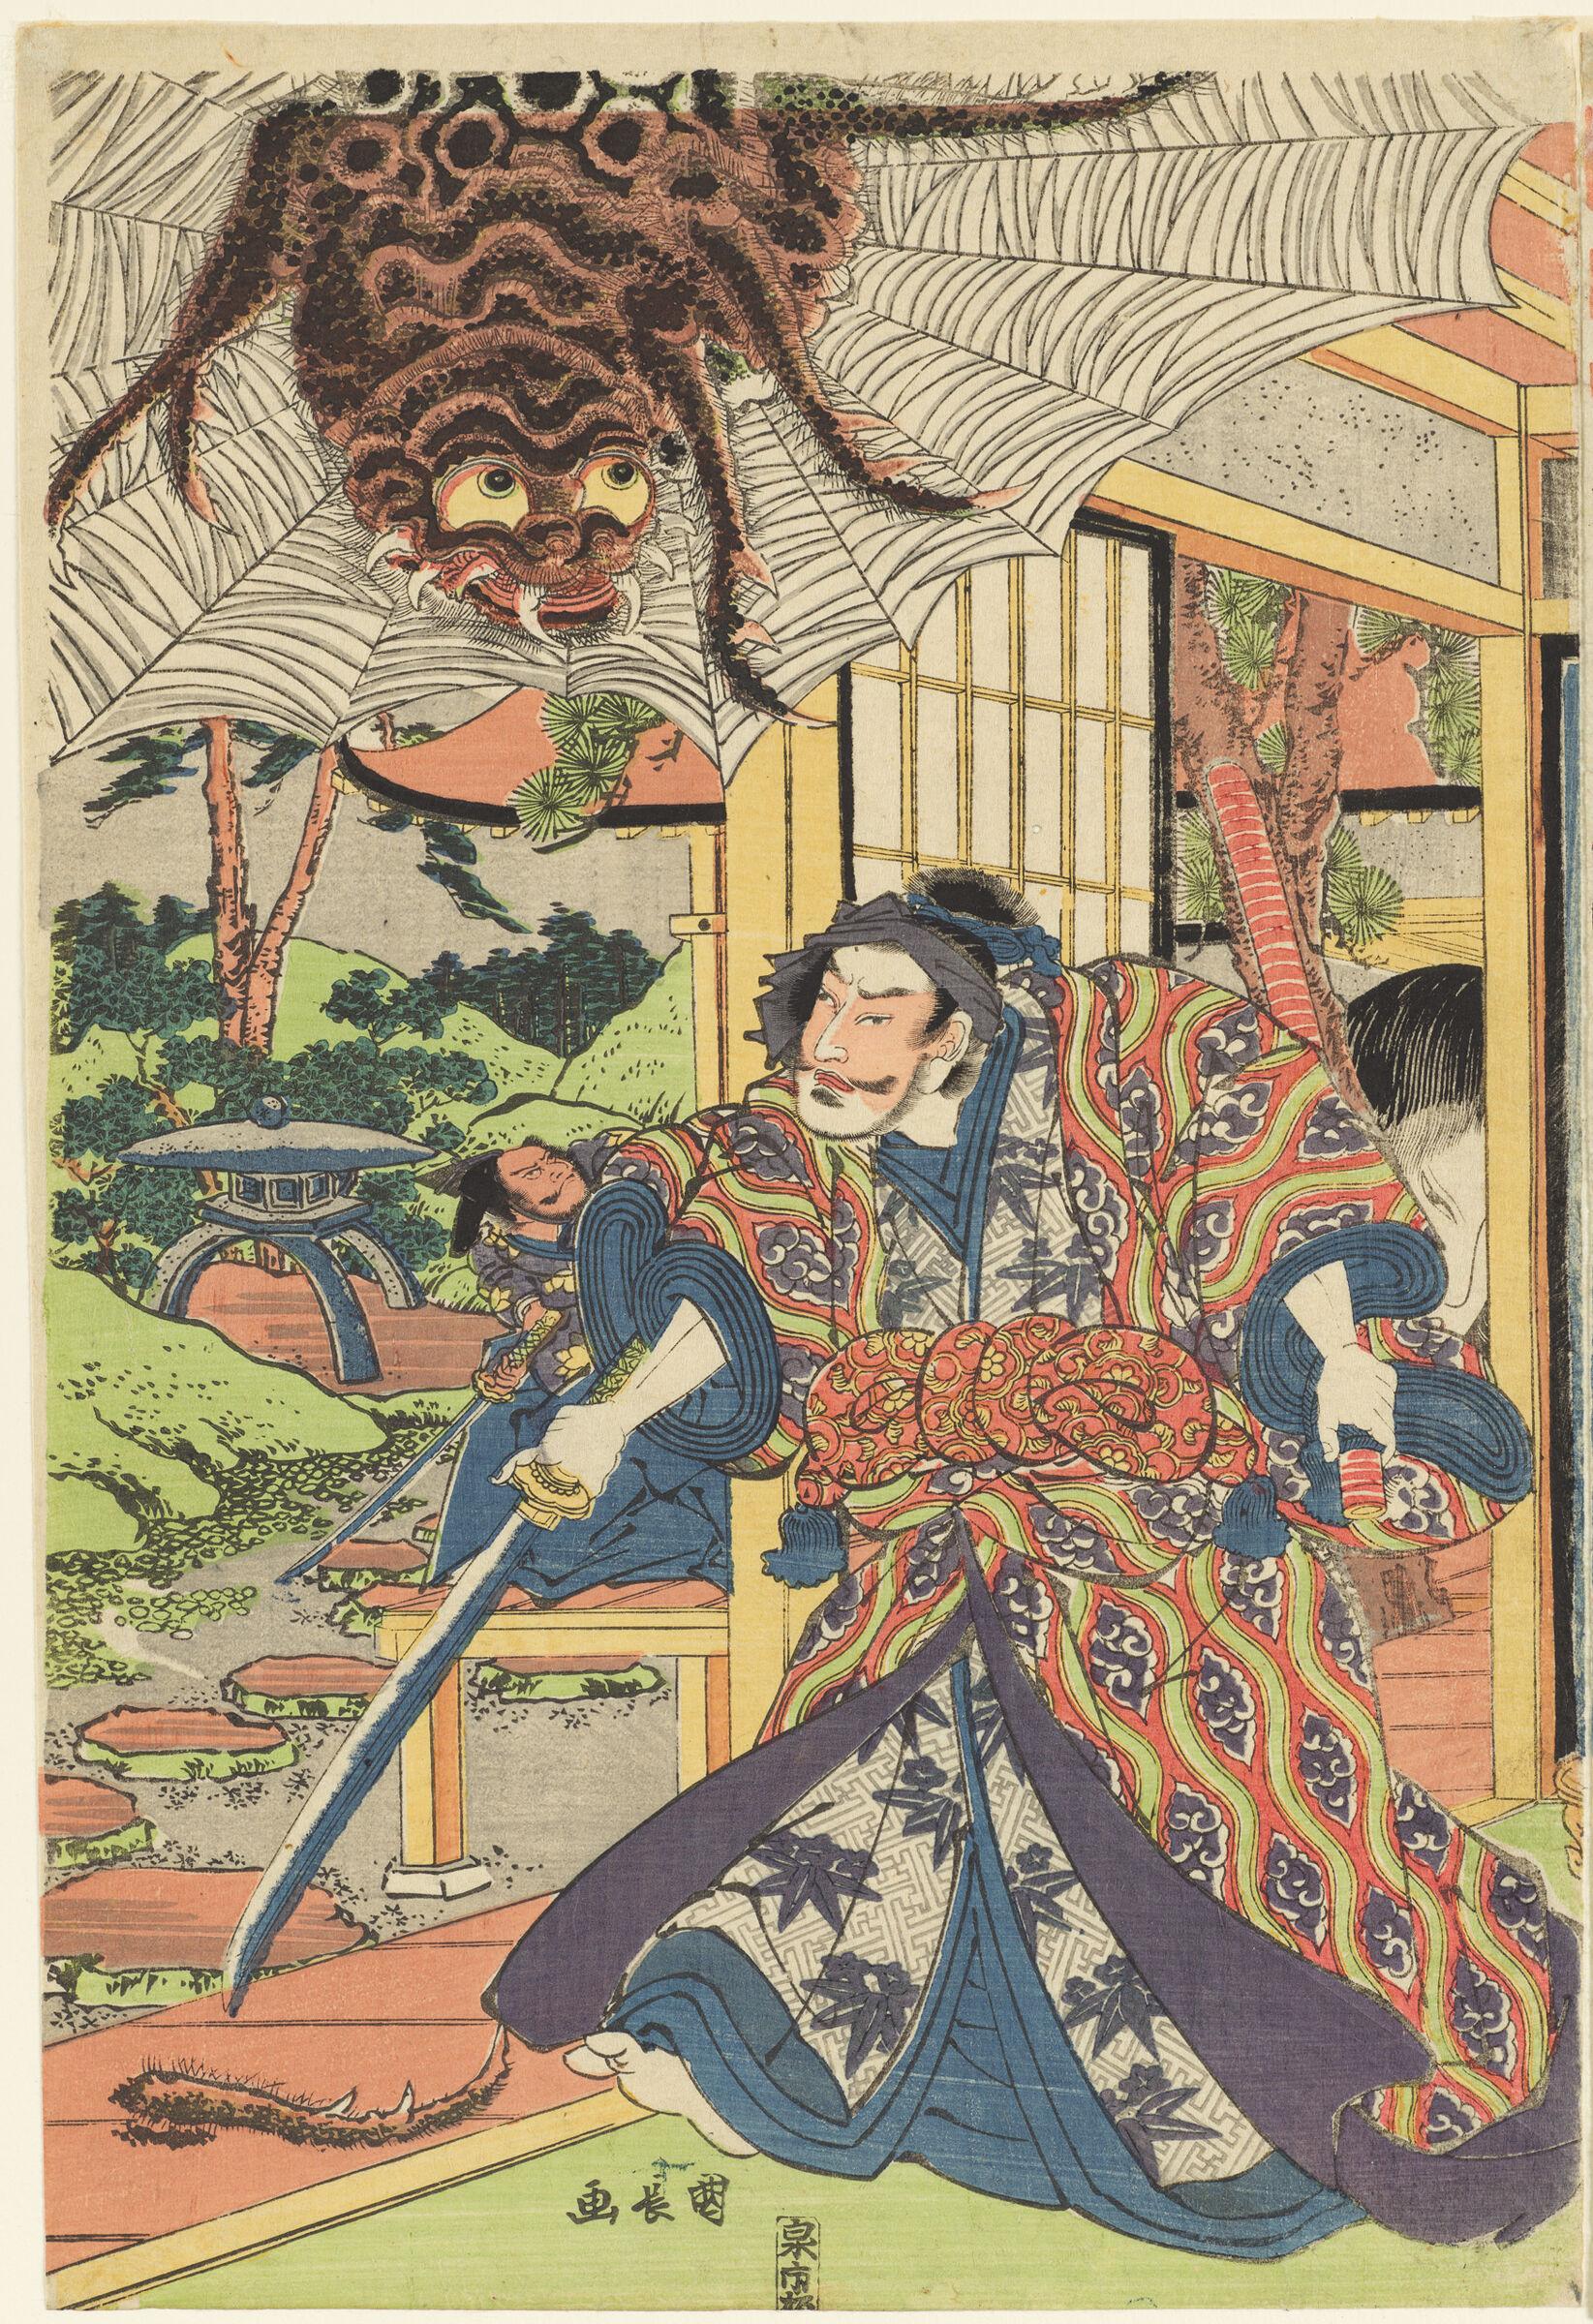 Minamoto Yorimitsu And His Retainers Defeat The Earth Spider